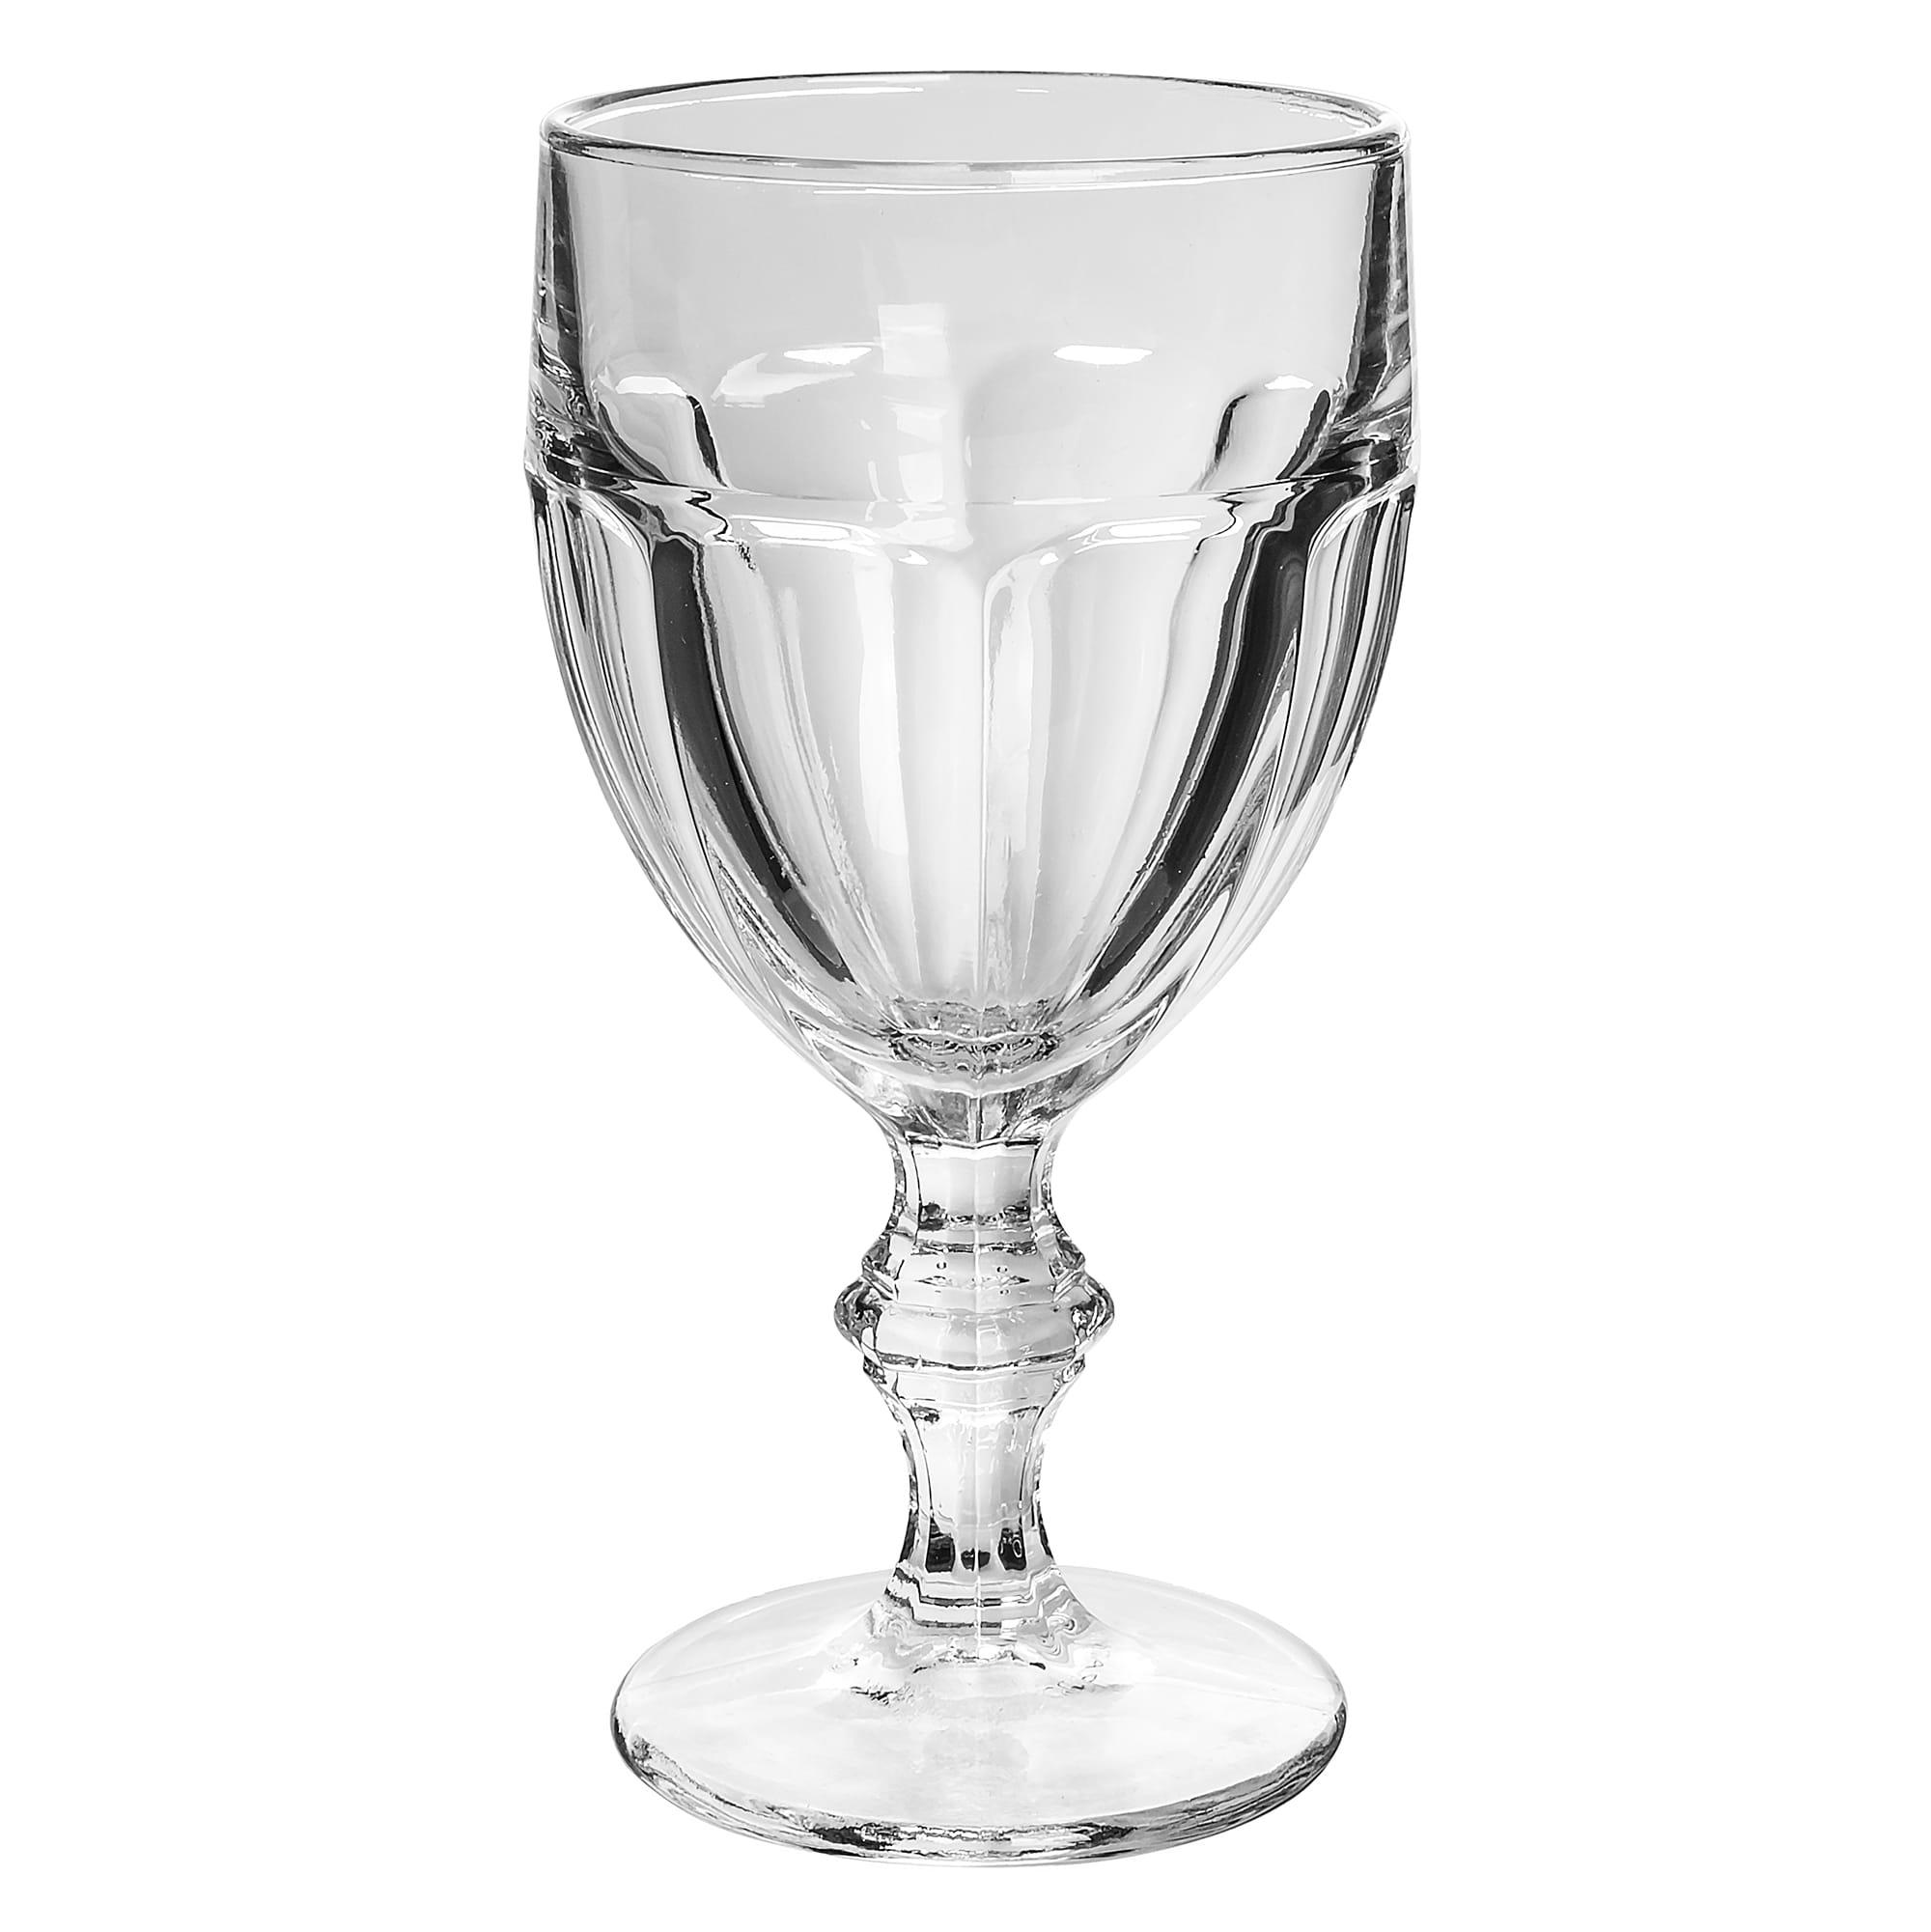 Libbey 15247 11.5-oz DuraTuff Gibraltar Wine Goblet